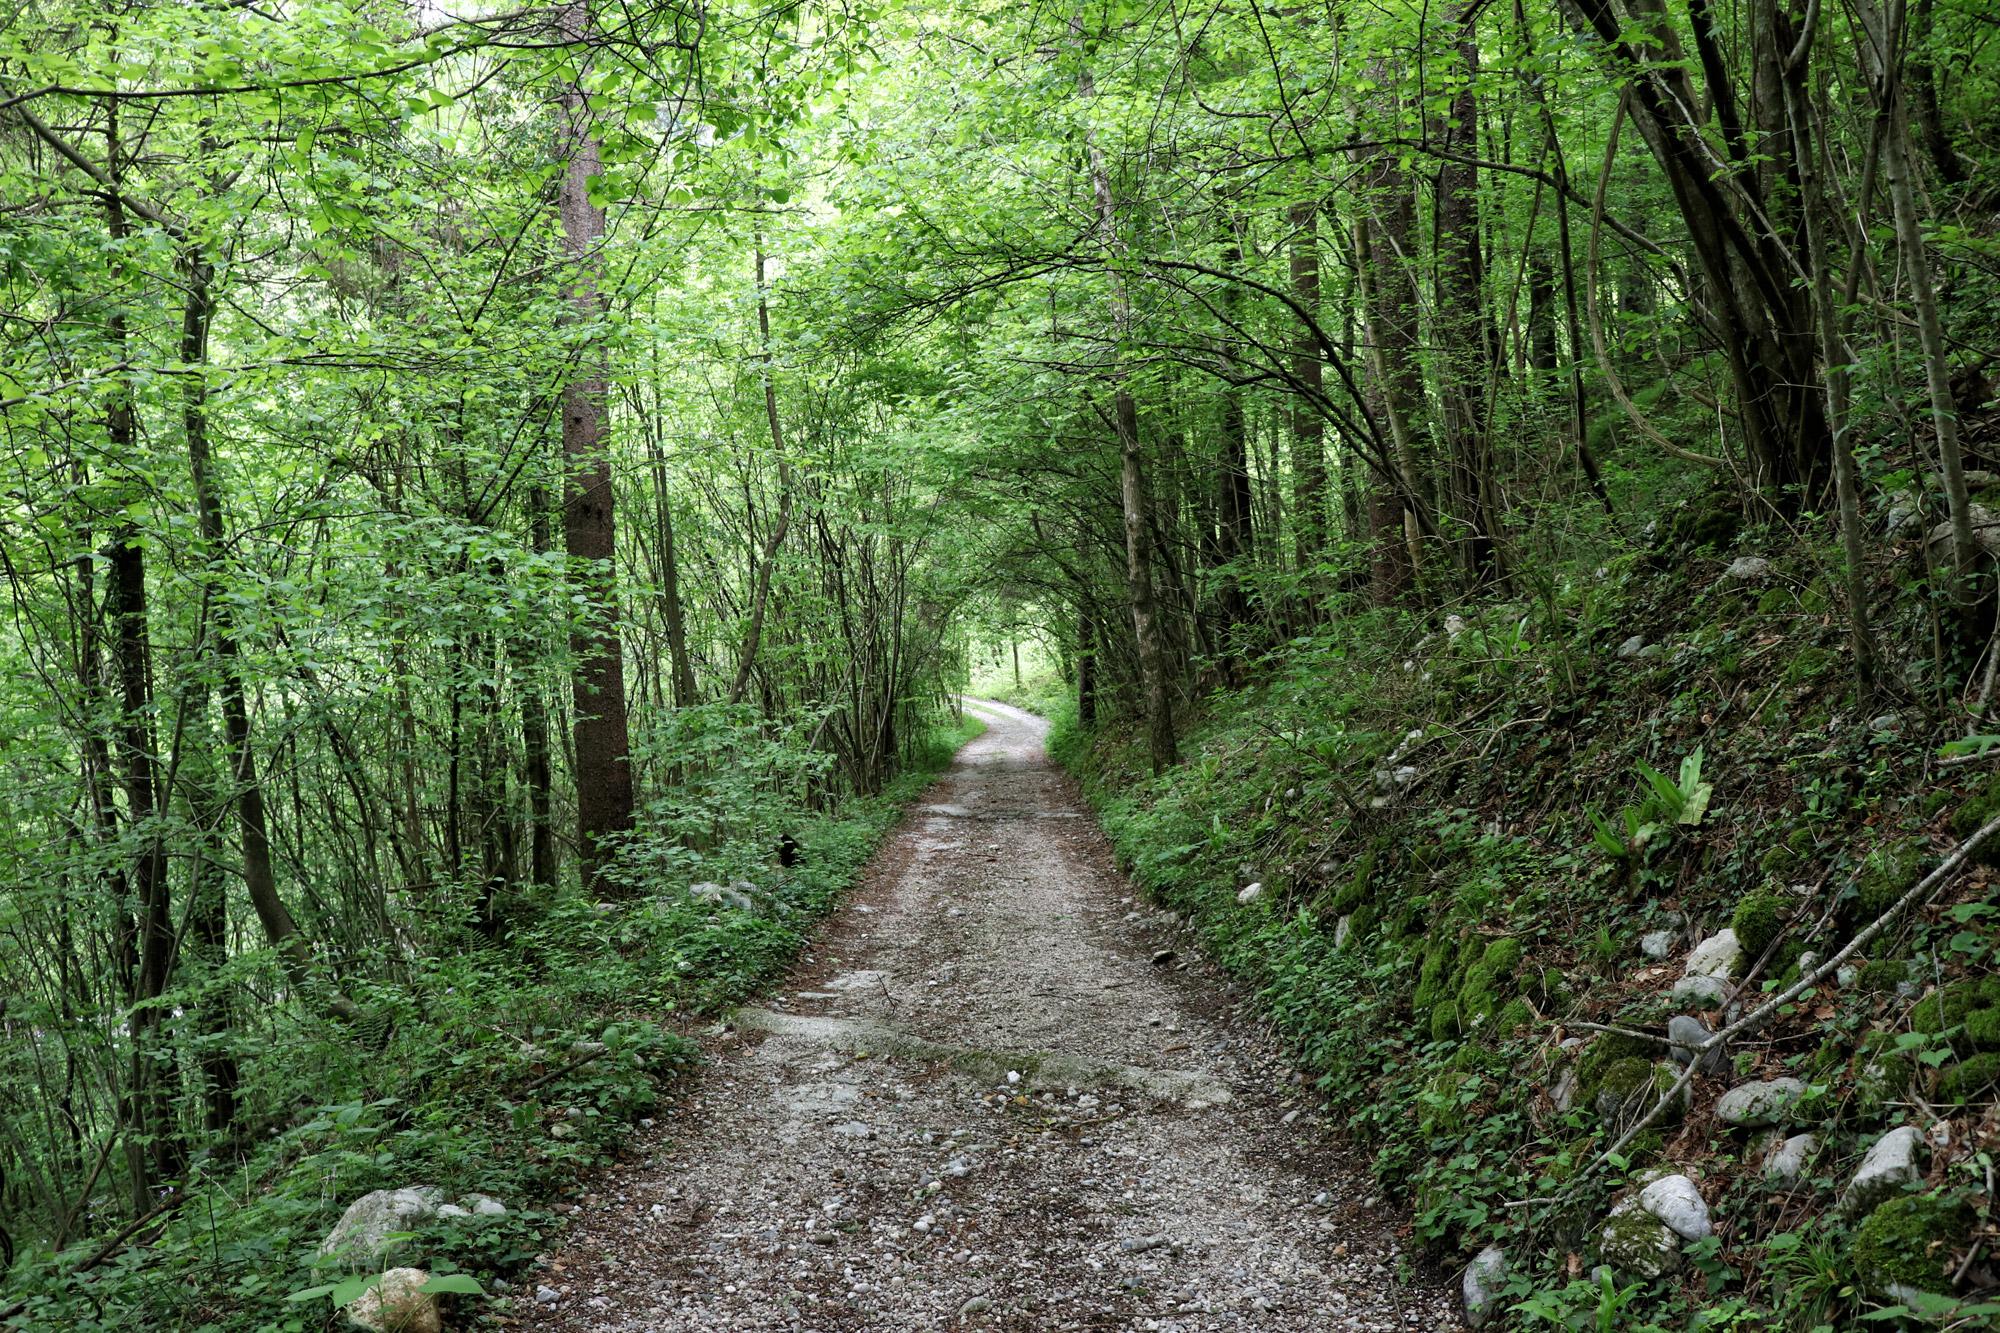 Soška pot wandeling in Slovenië - Startpunt bij Trnovo